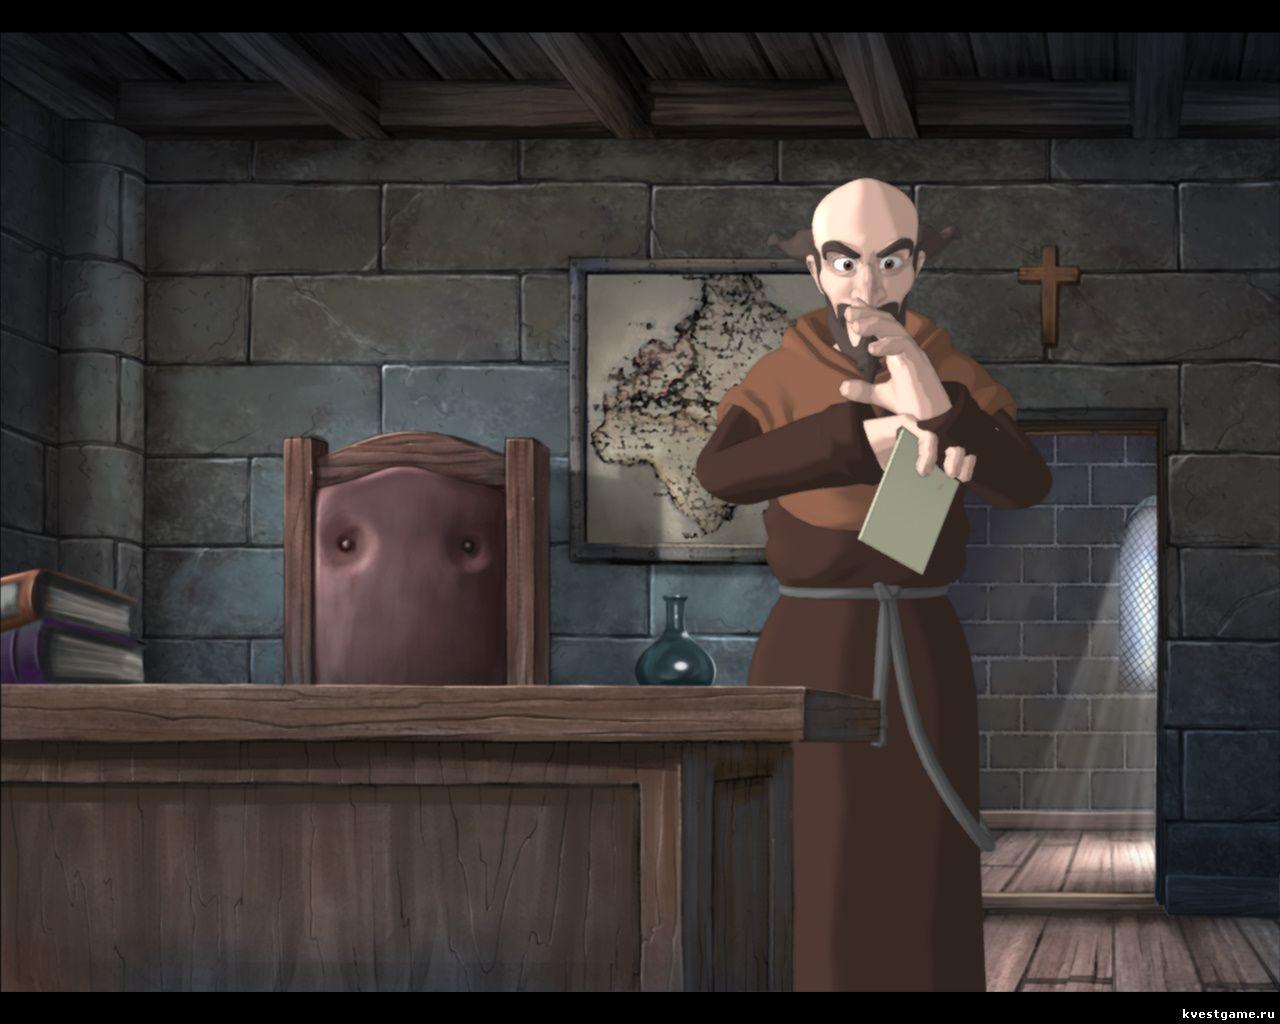 Murder in the Abbey - Приор шантажировал Эгидия письмом (глава 4)